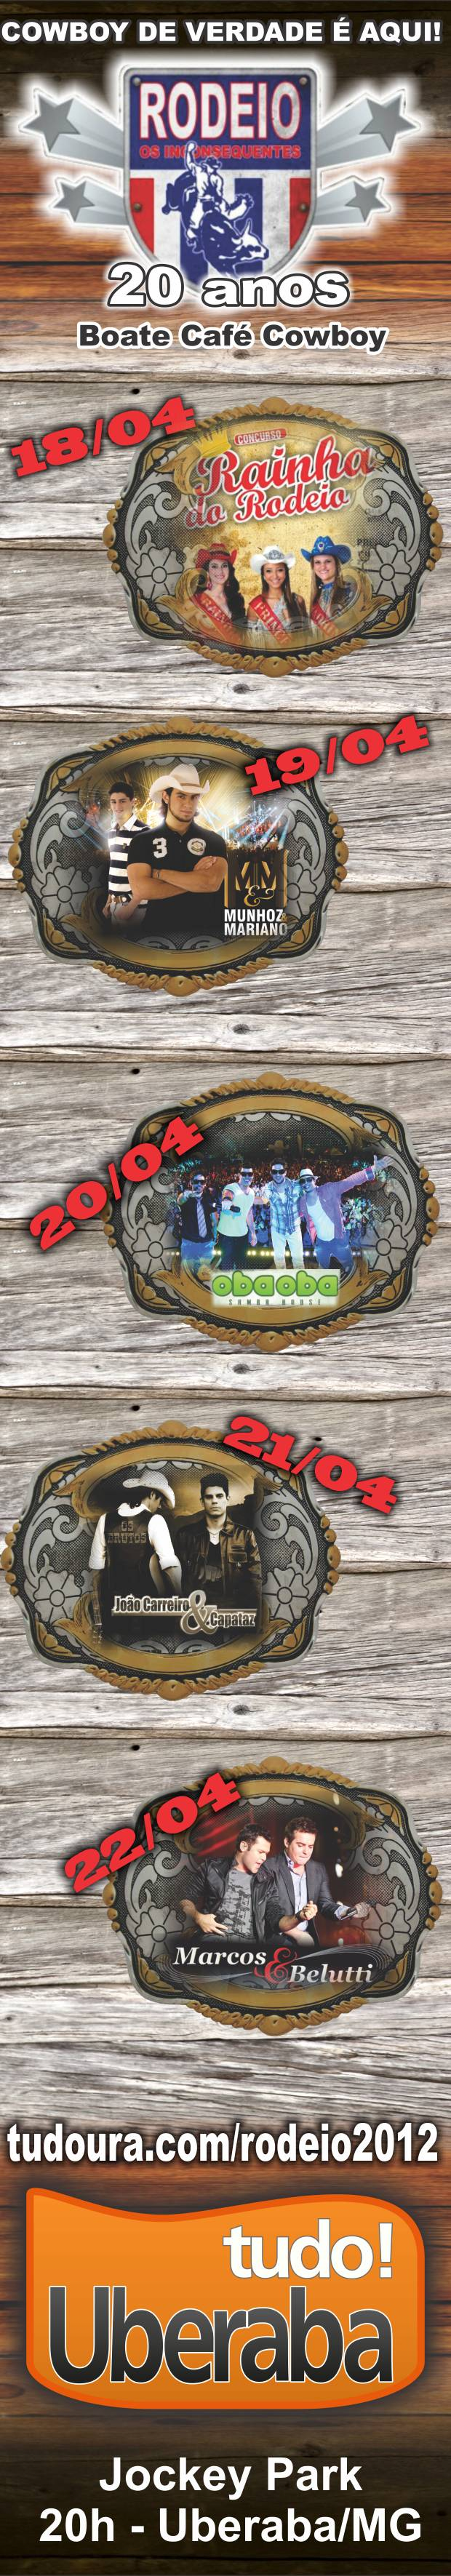 Rodeio Uberaba Os Inconsequentes 2012